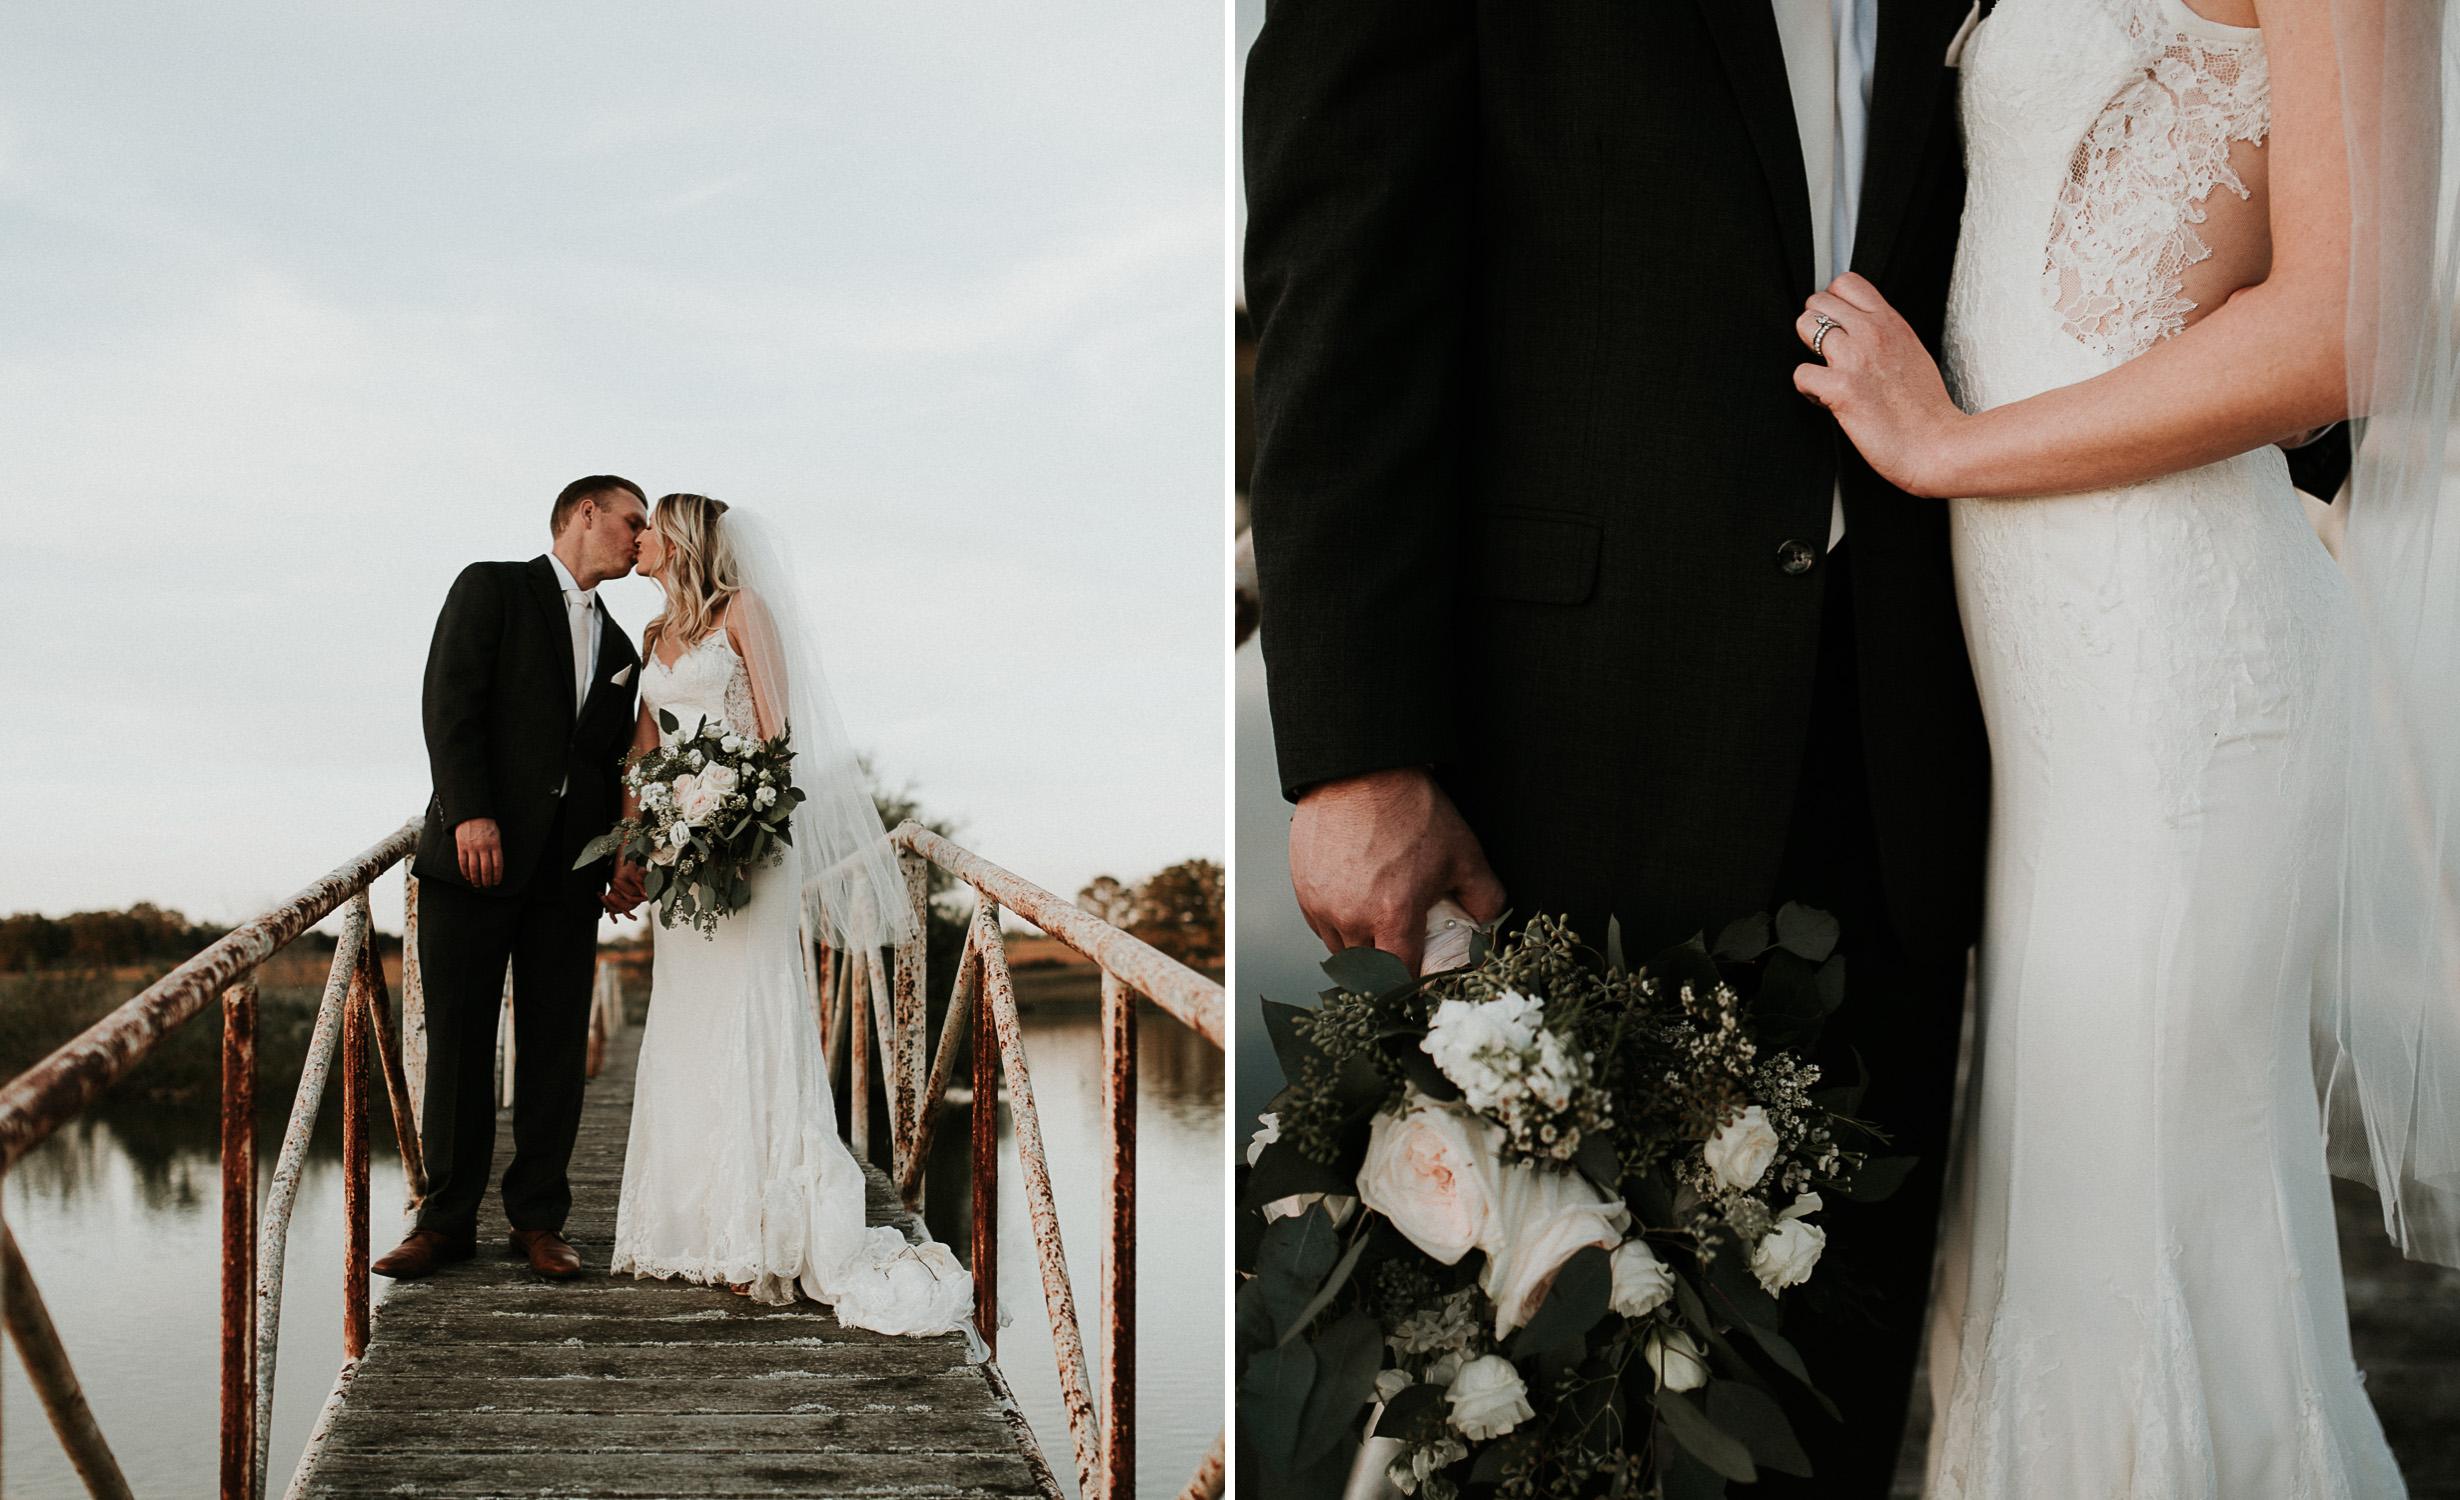 Zach&Rosalie St. Louis Wedding Photographer 8.jpg